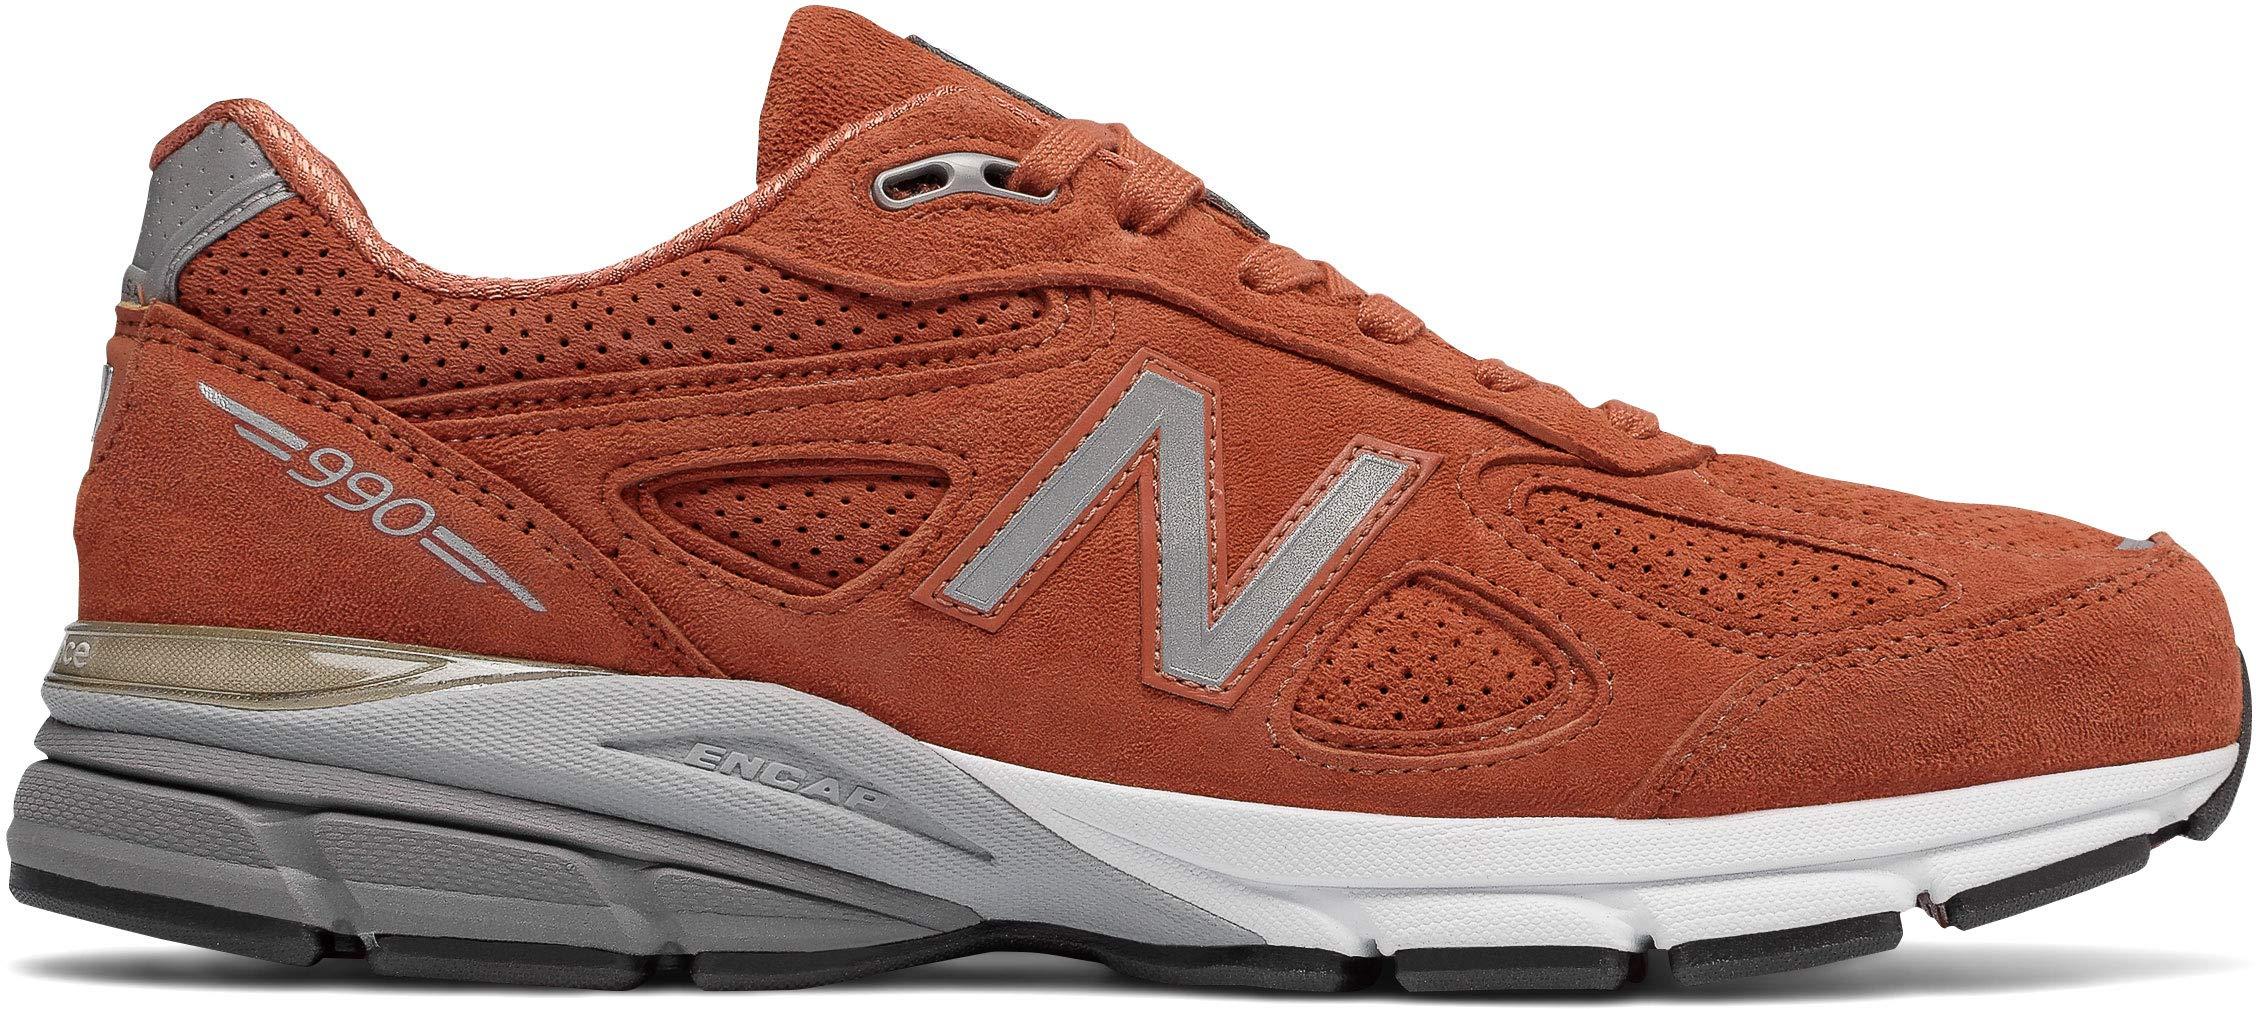 New Balance PERFRUN 990v4 Orange by New Balance